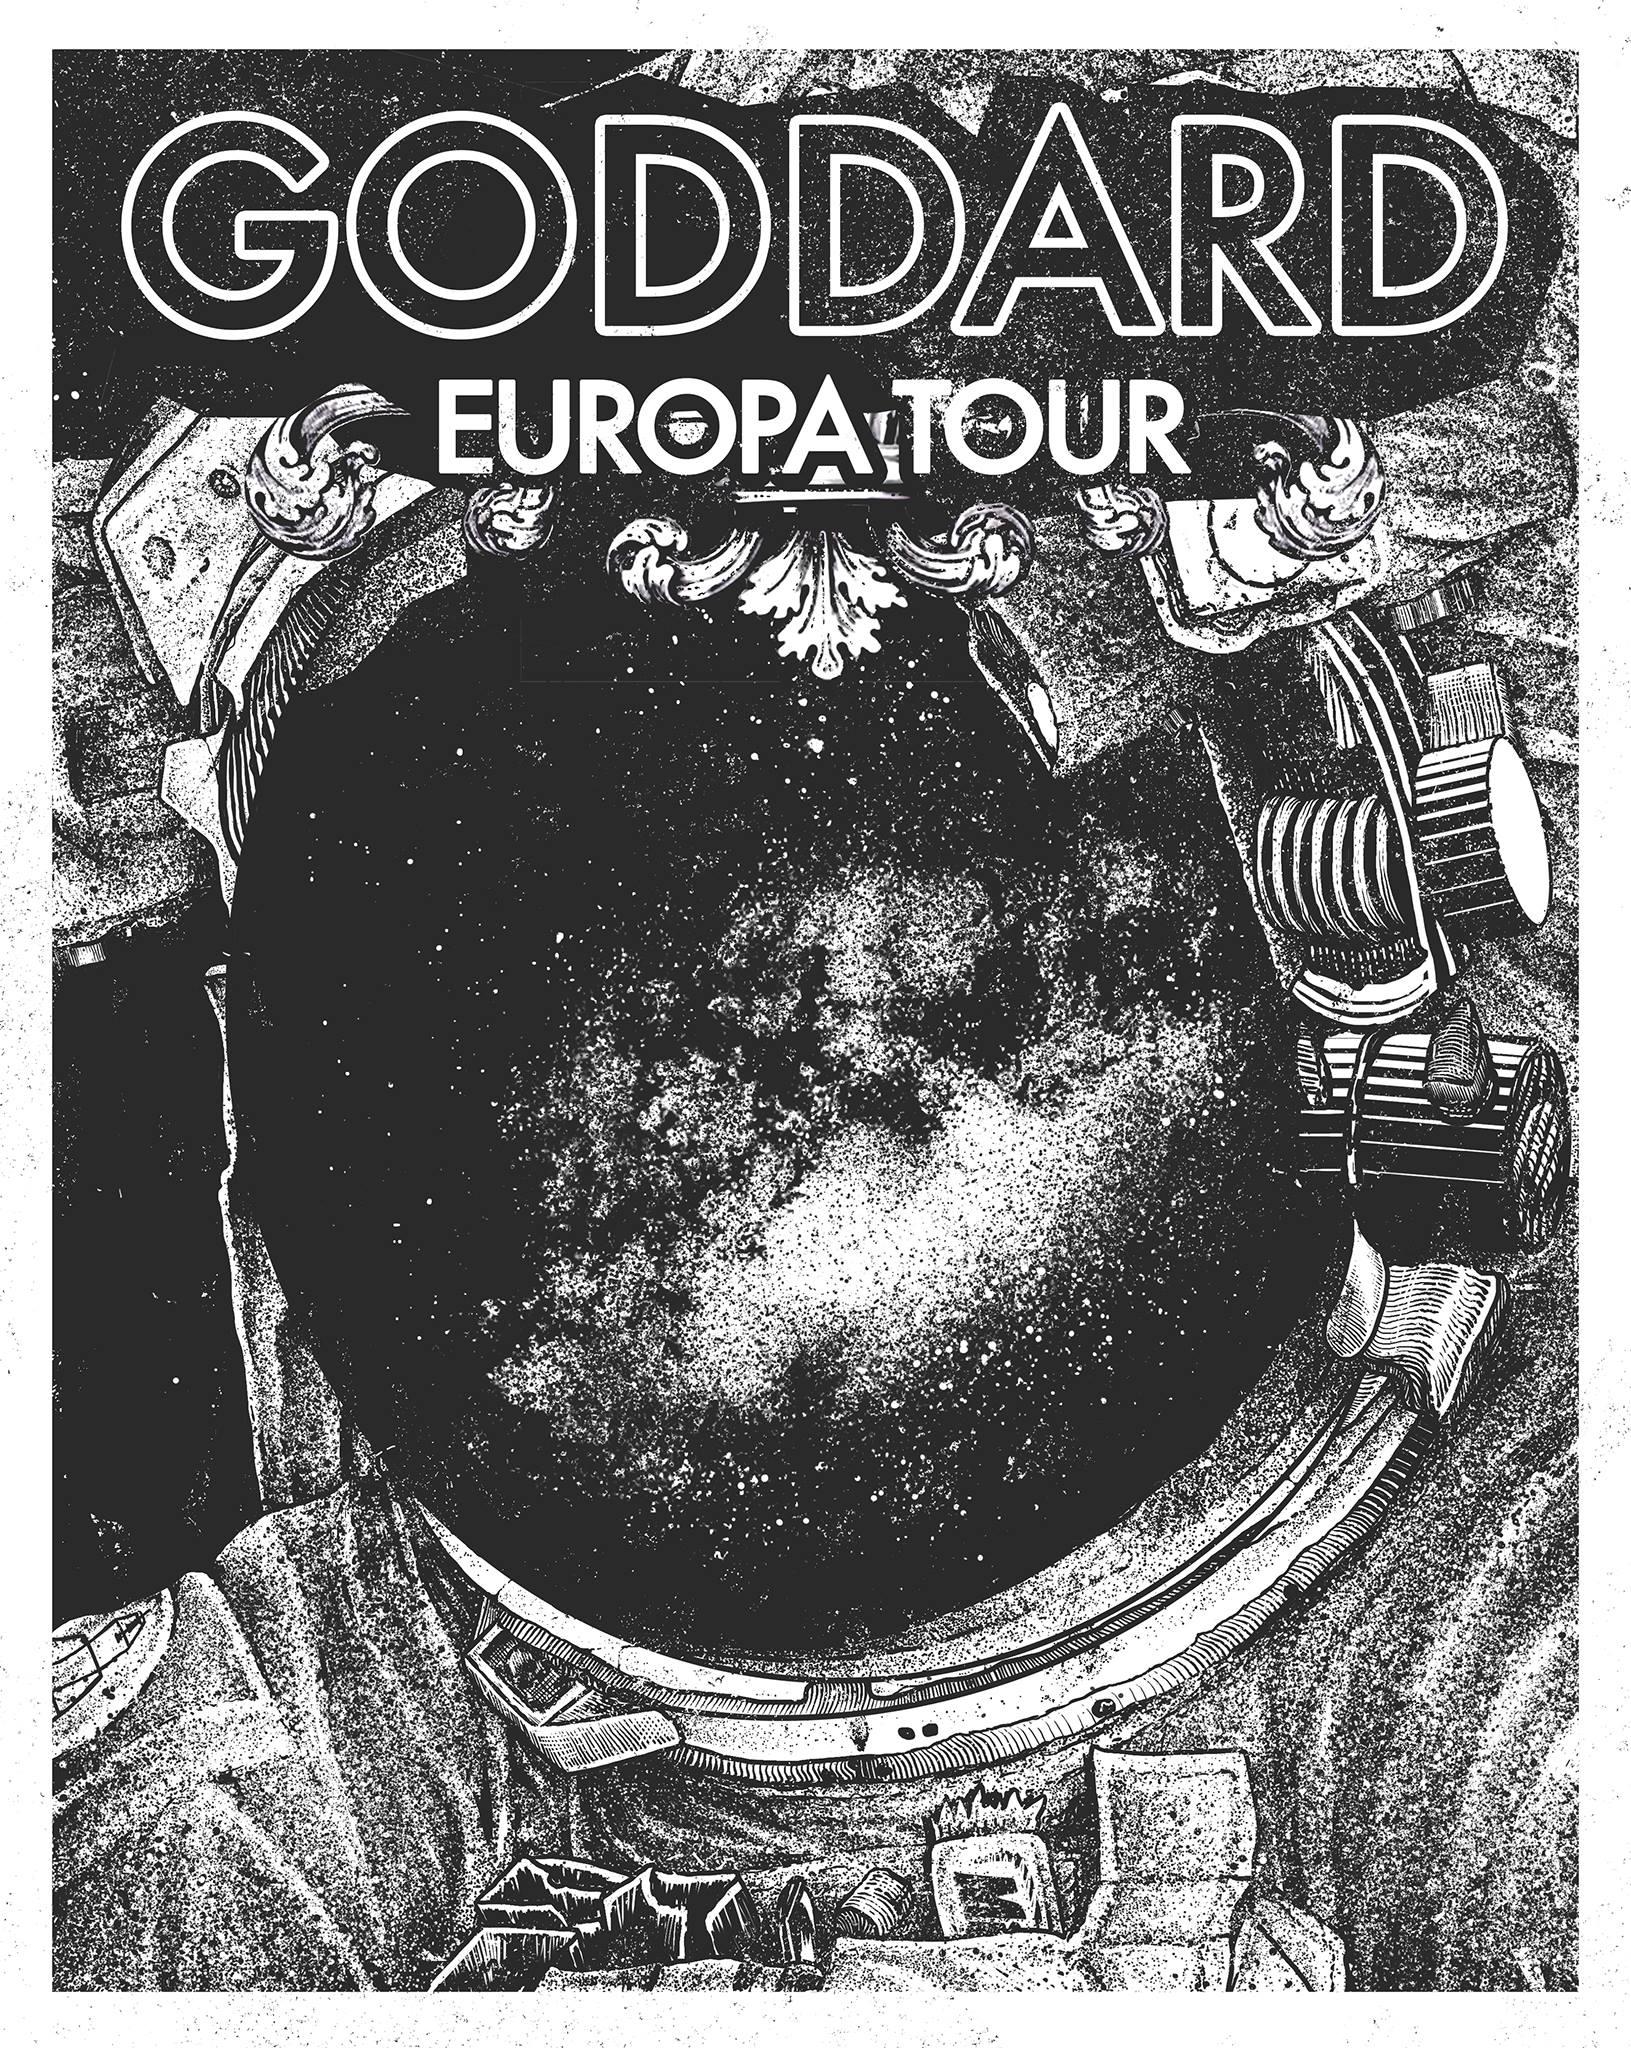 GODDARD (us) + SPACE SIREN + THE SASTERS + DJ JUJU + + Do It Together Docu